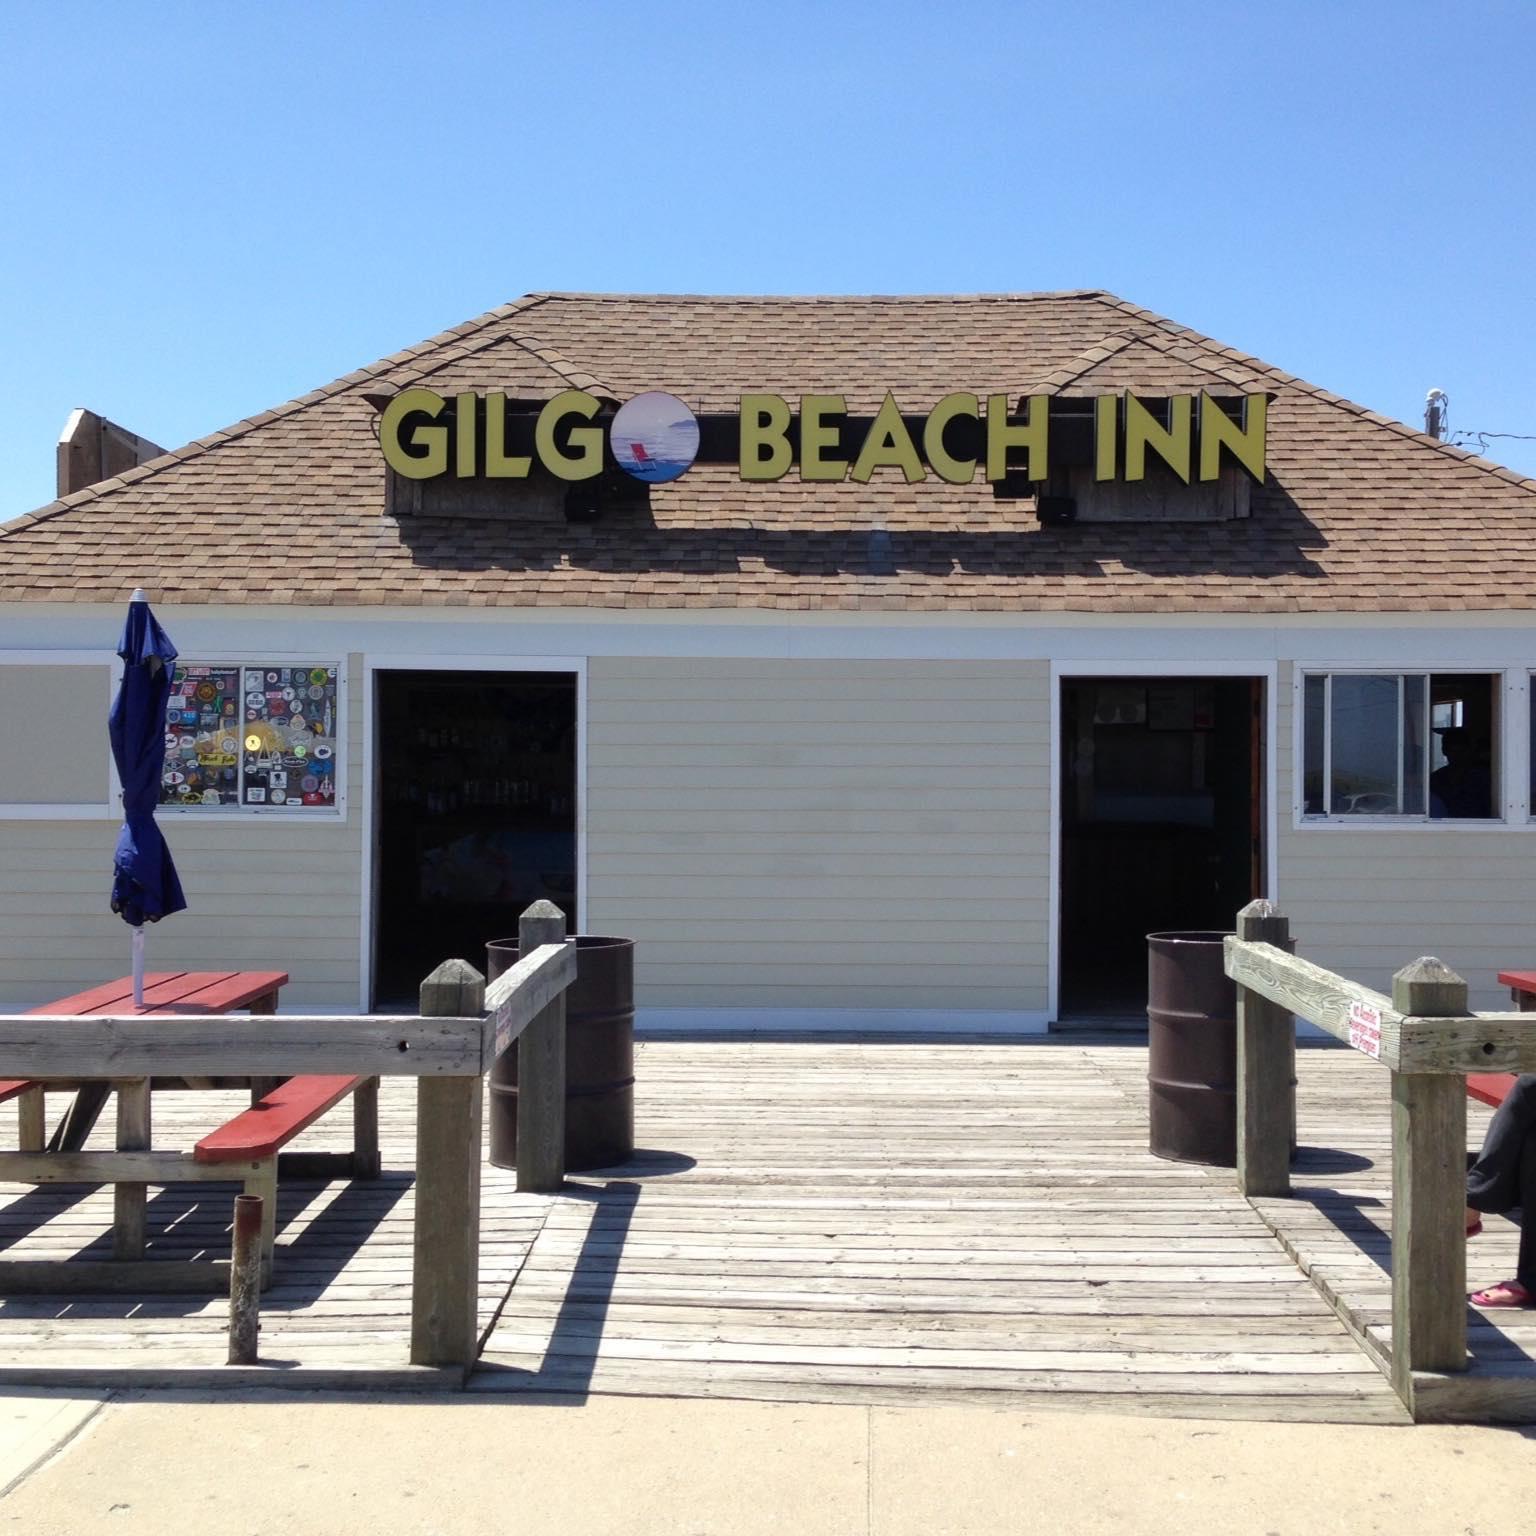 Photo by Gilgo Beach Inn via Website